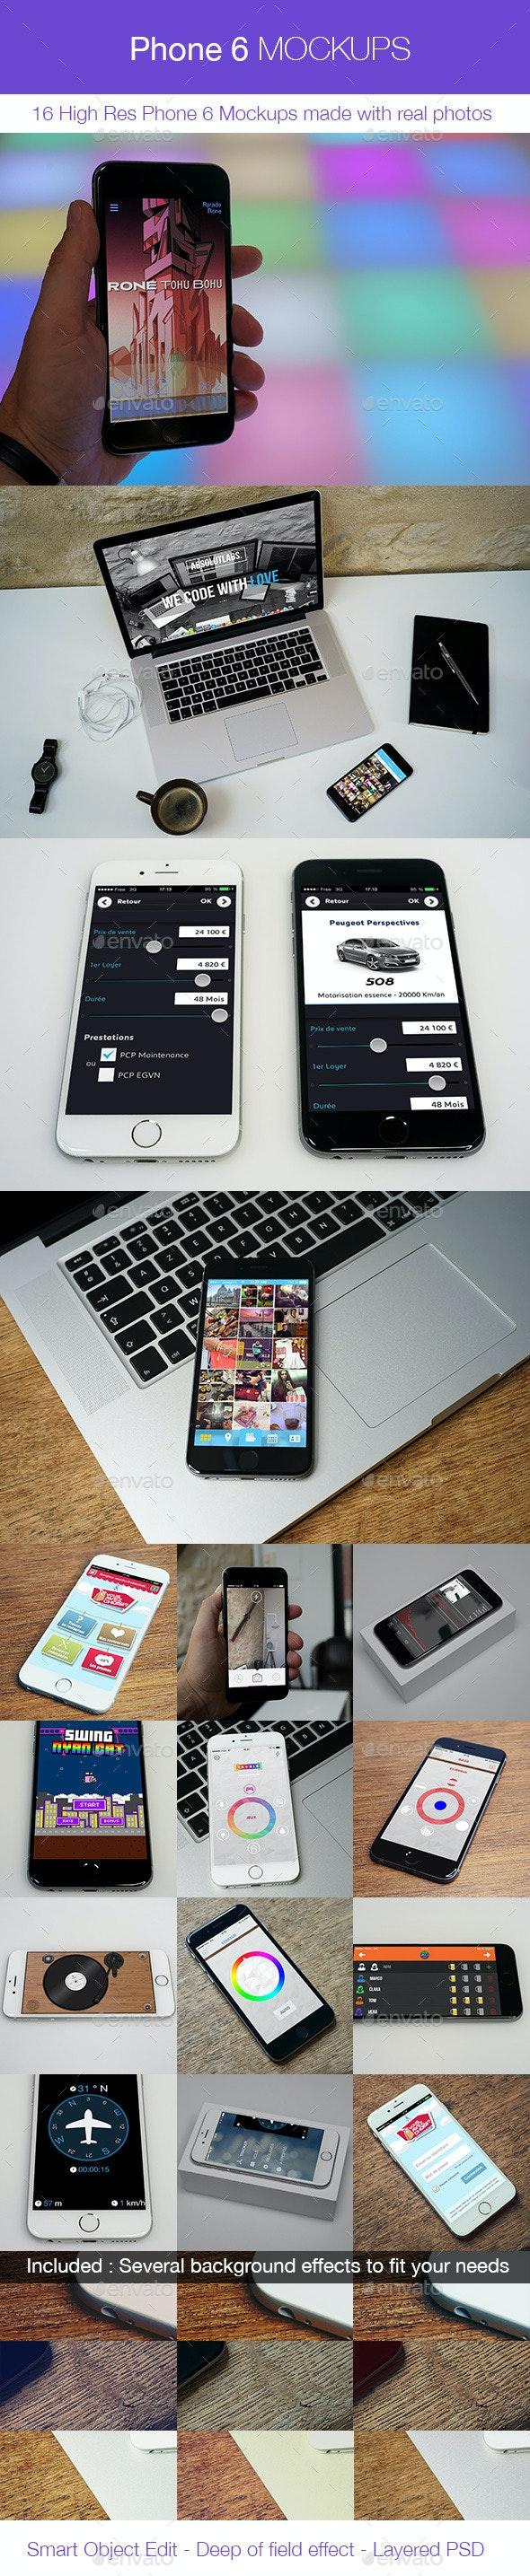 Phone 6 Mockups - 16 Phone 6 Real Photos Mockups - Mobile Displays